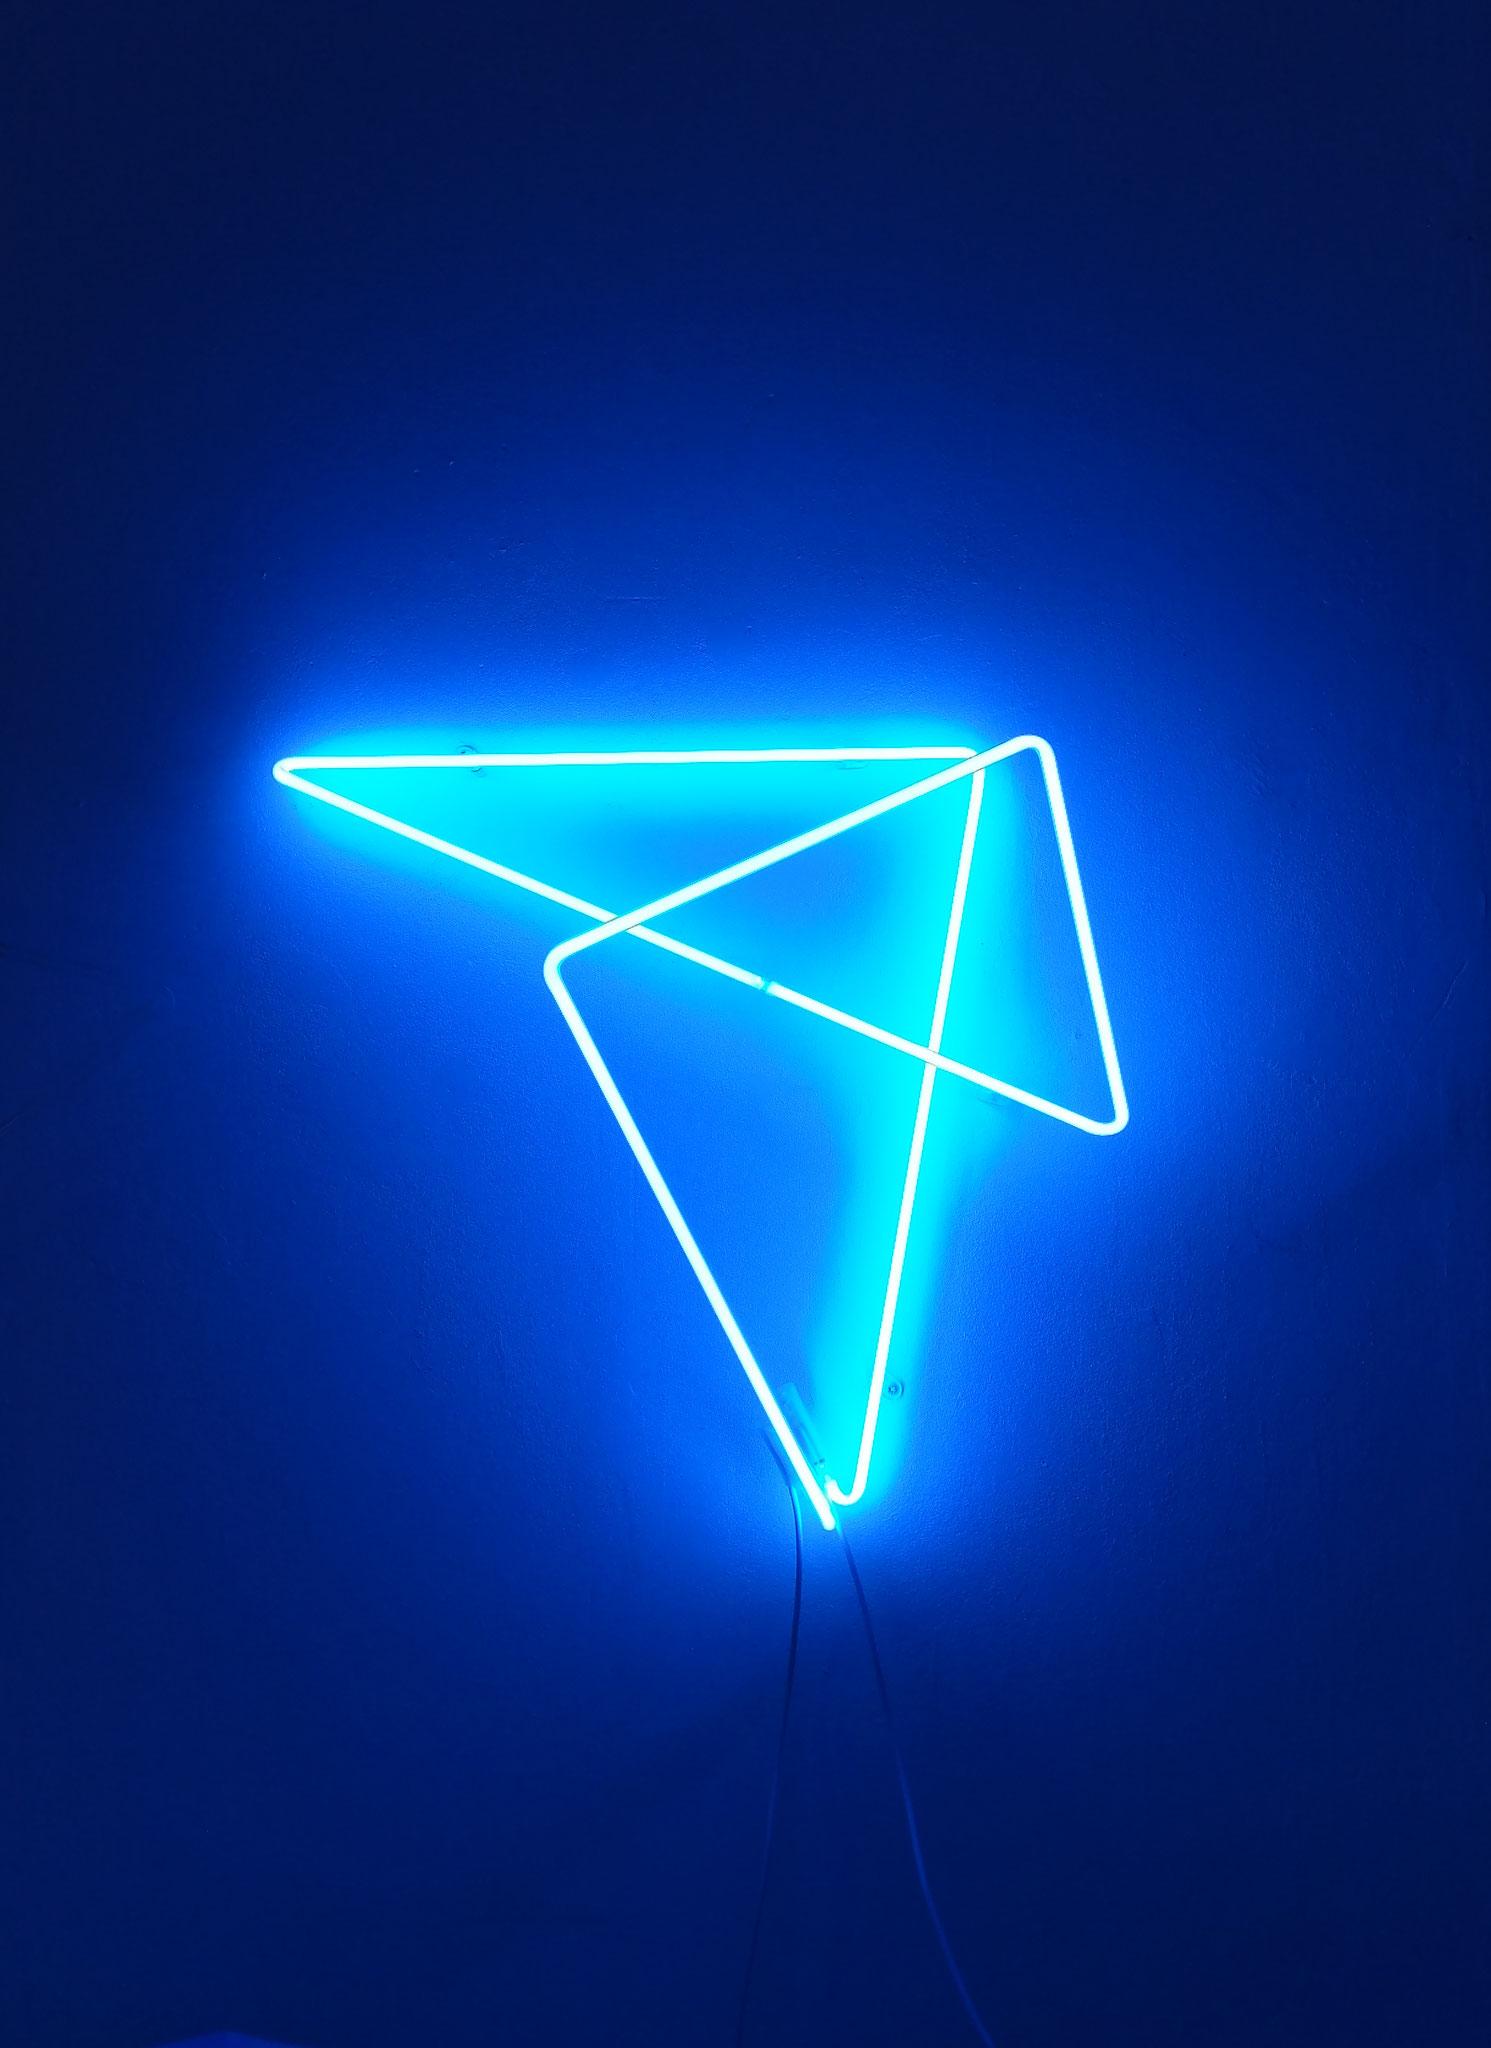 one line six corners, 2021, Edition 2, 2 von 3, Neon blau, circa 55 x 60 x 30 cm